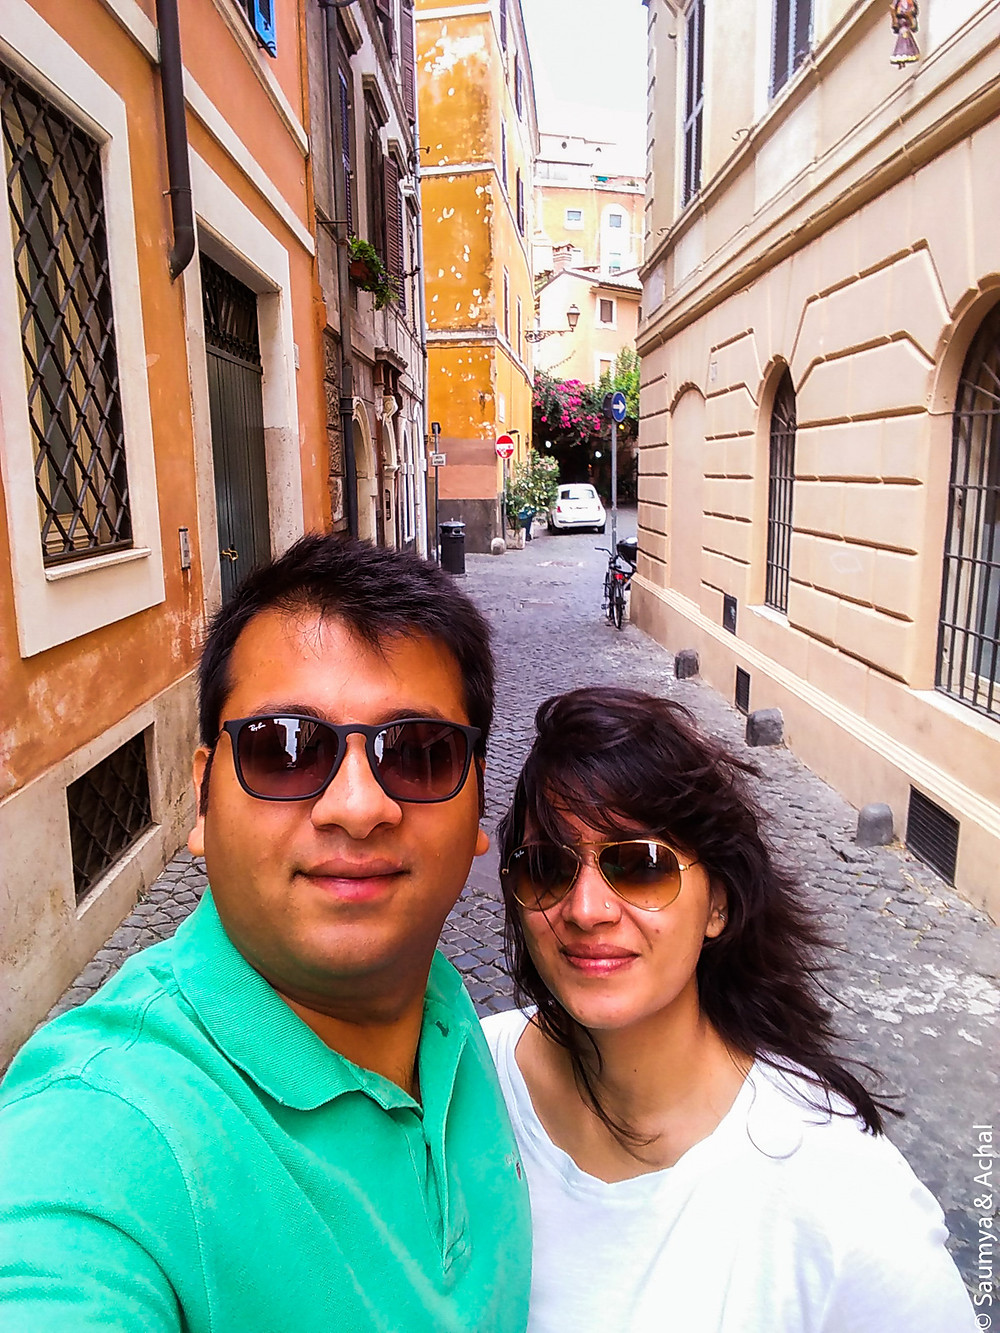 The quaint cobble-stoned streets of Trastevere, Rome